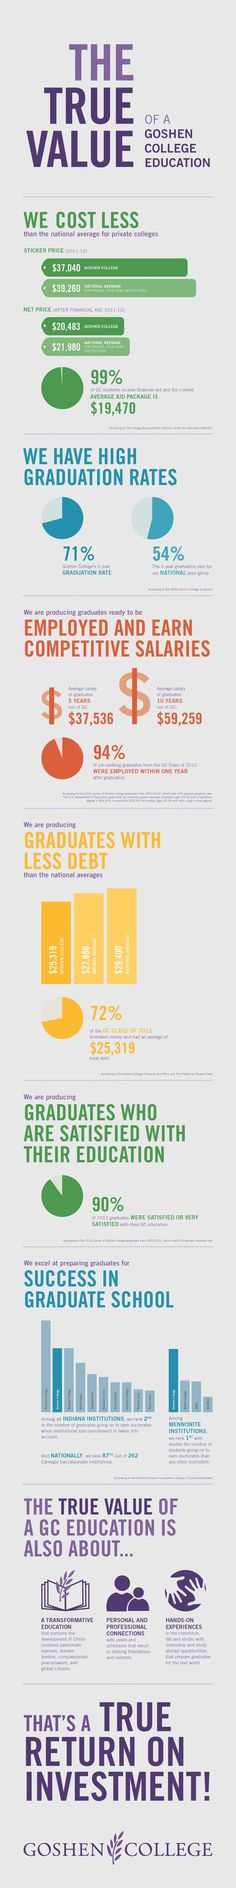 What is the true value of a Goshen College education? Values Education, Education College, Goshen College, True Value, Student Success, Graduate School, University